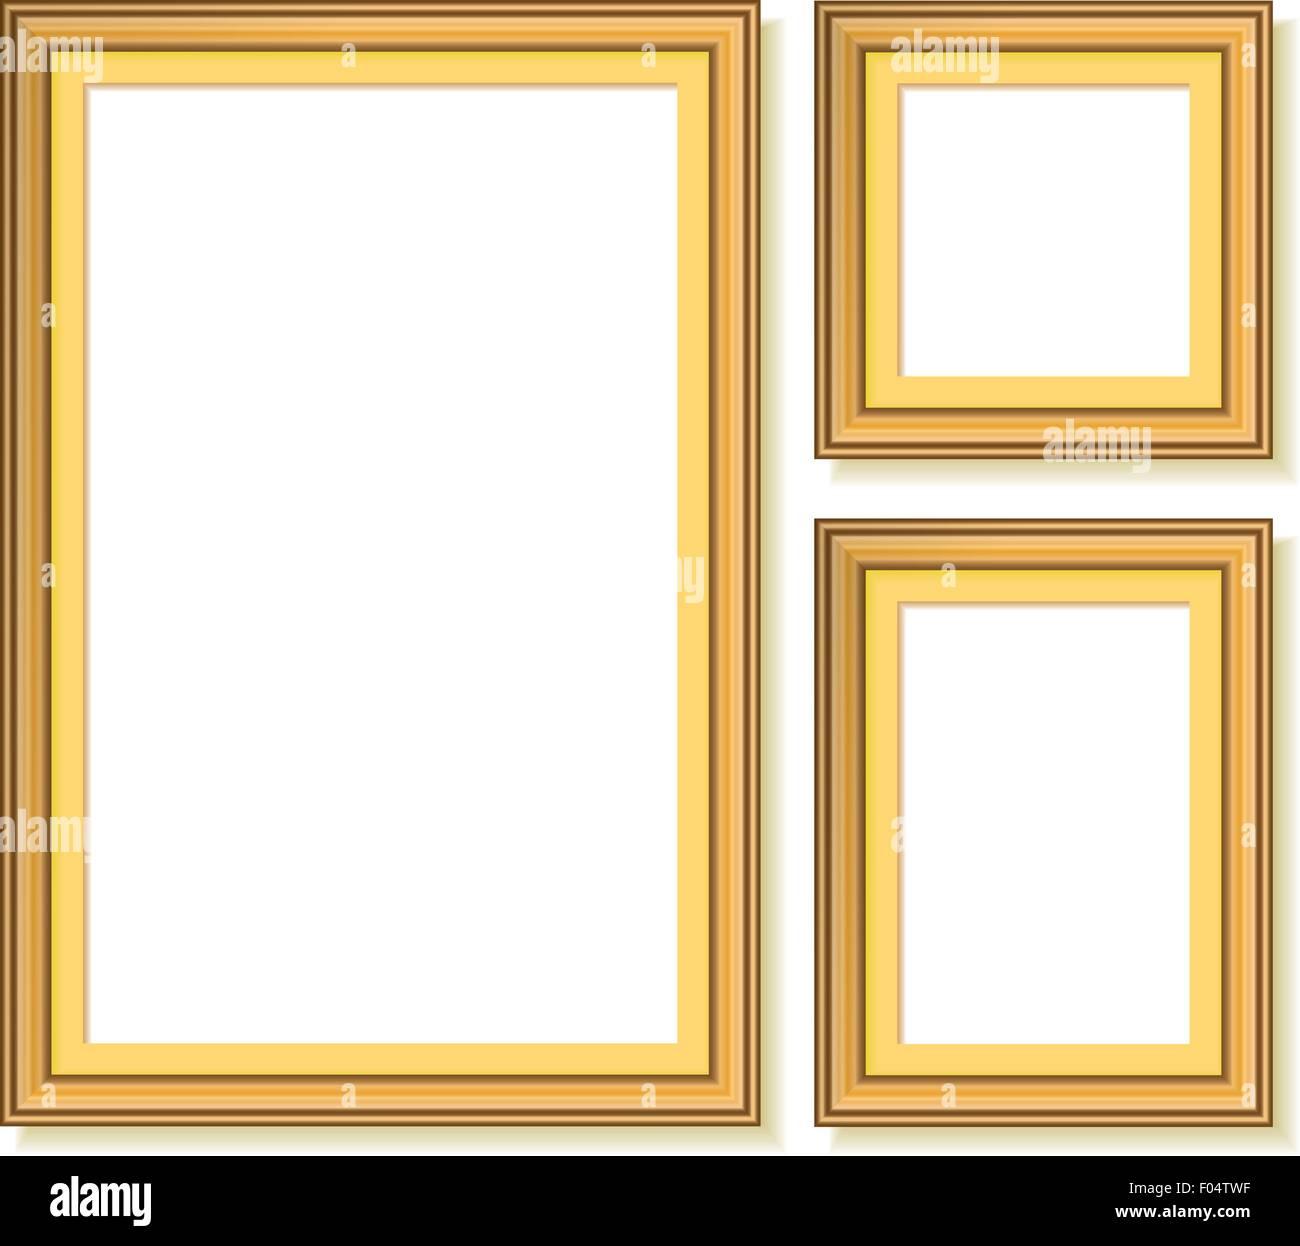 Satz von goldenen Rahmen. Vektor-illustration Vektor Abbildung ...